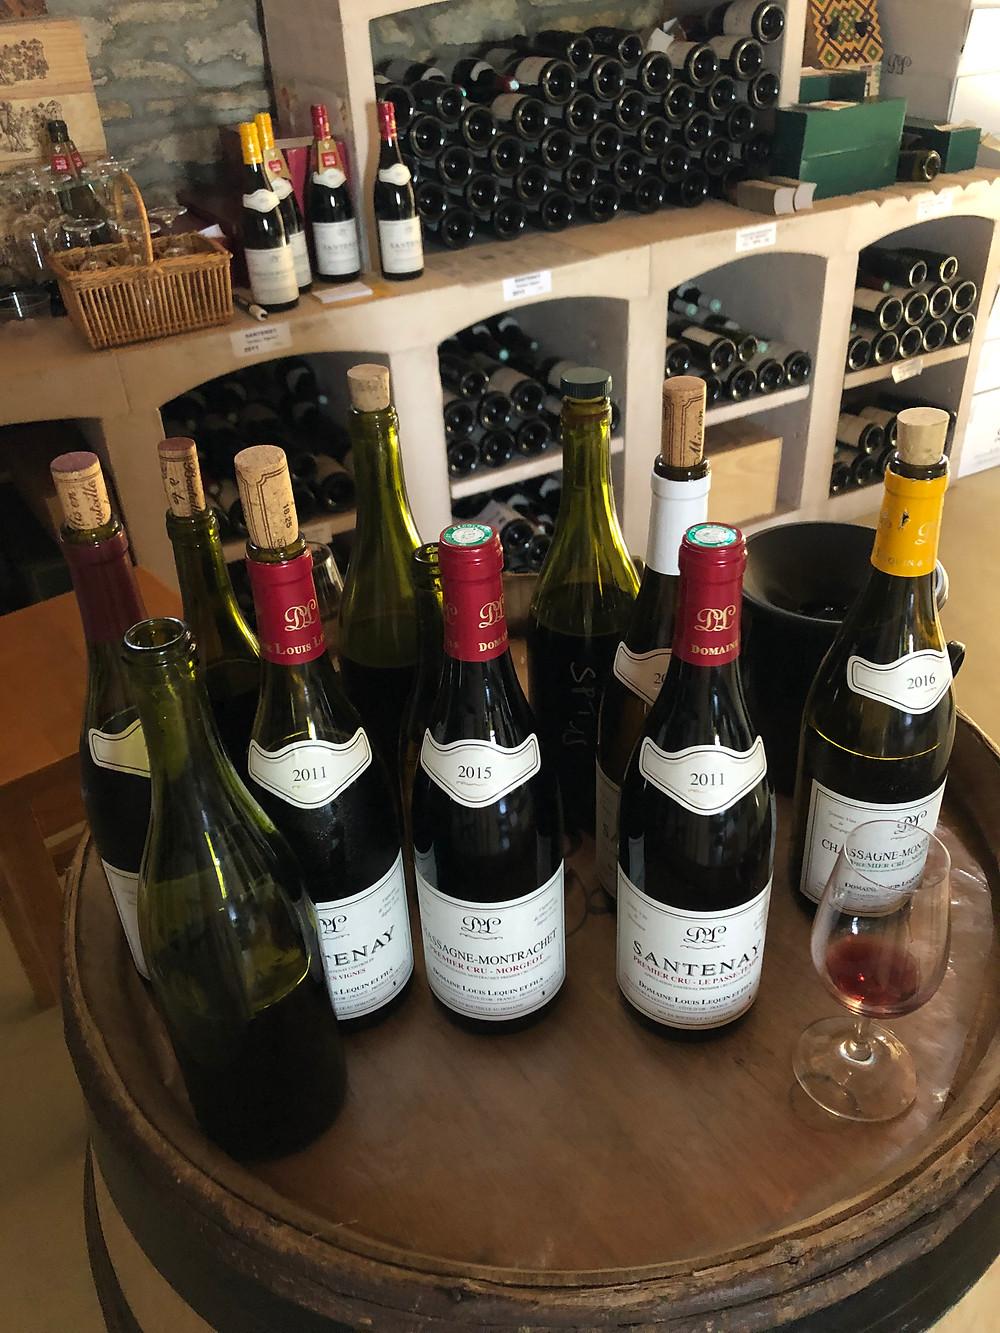 Santenay wine tasting at Domaine Louis Lequin in Cote de Beaune Burgundy wine tour